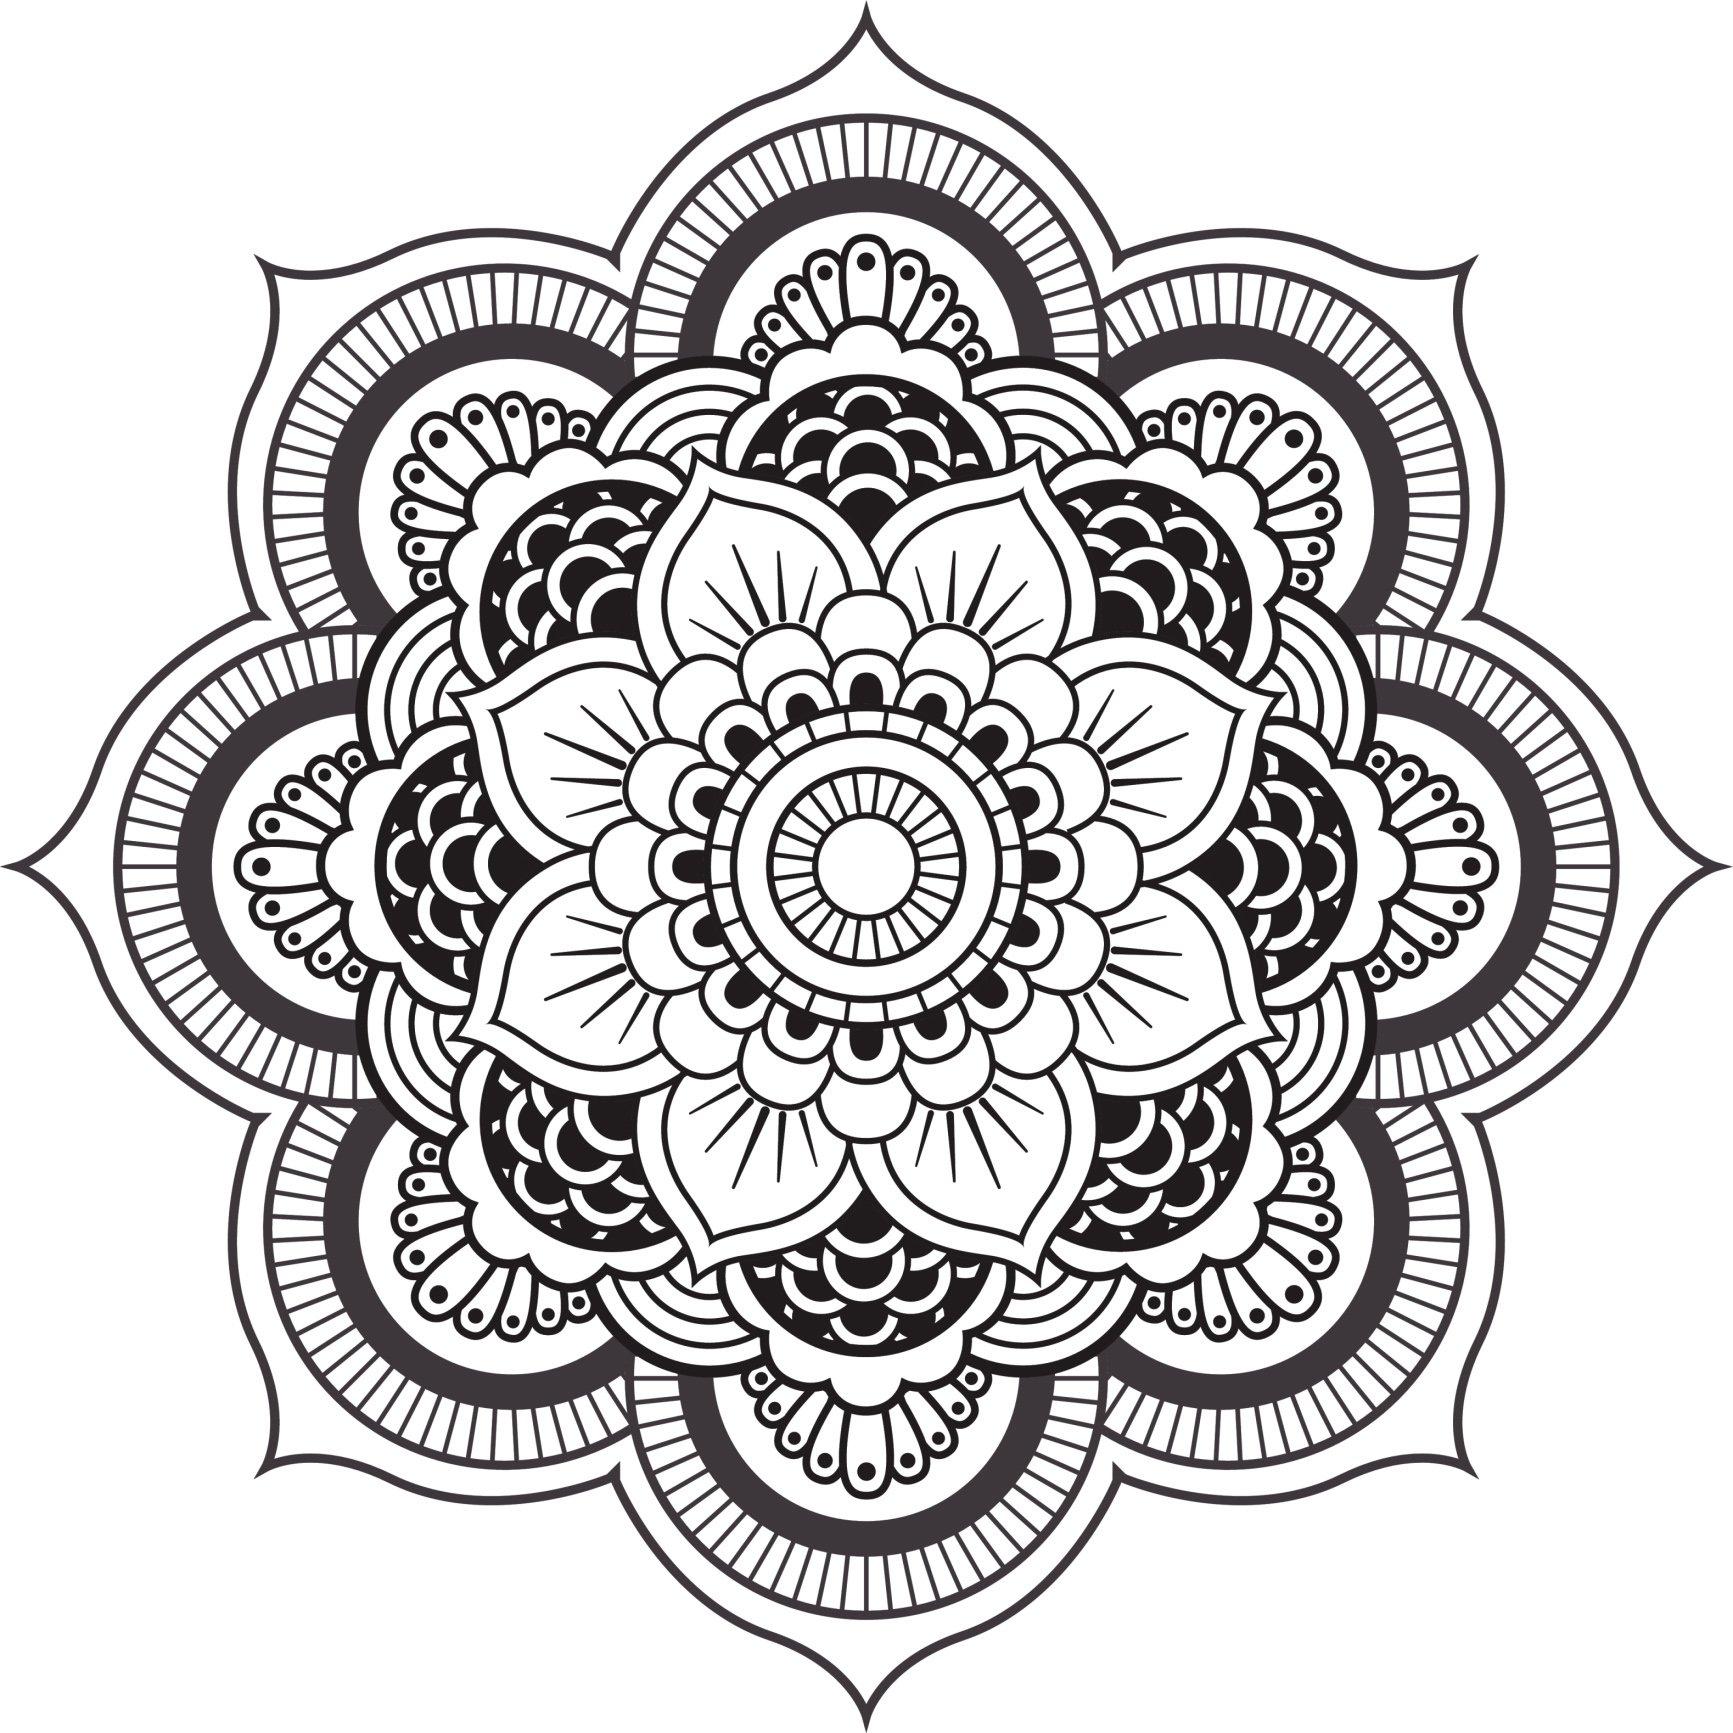 1733x1733 Detailed Mandala Design Black White Vinyl Decal Sticker Two In One